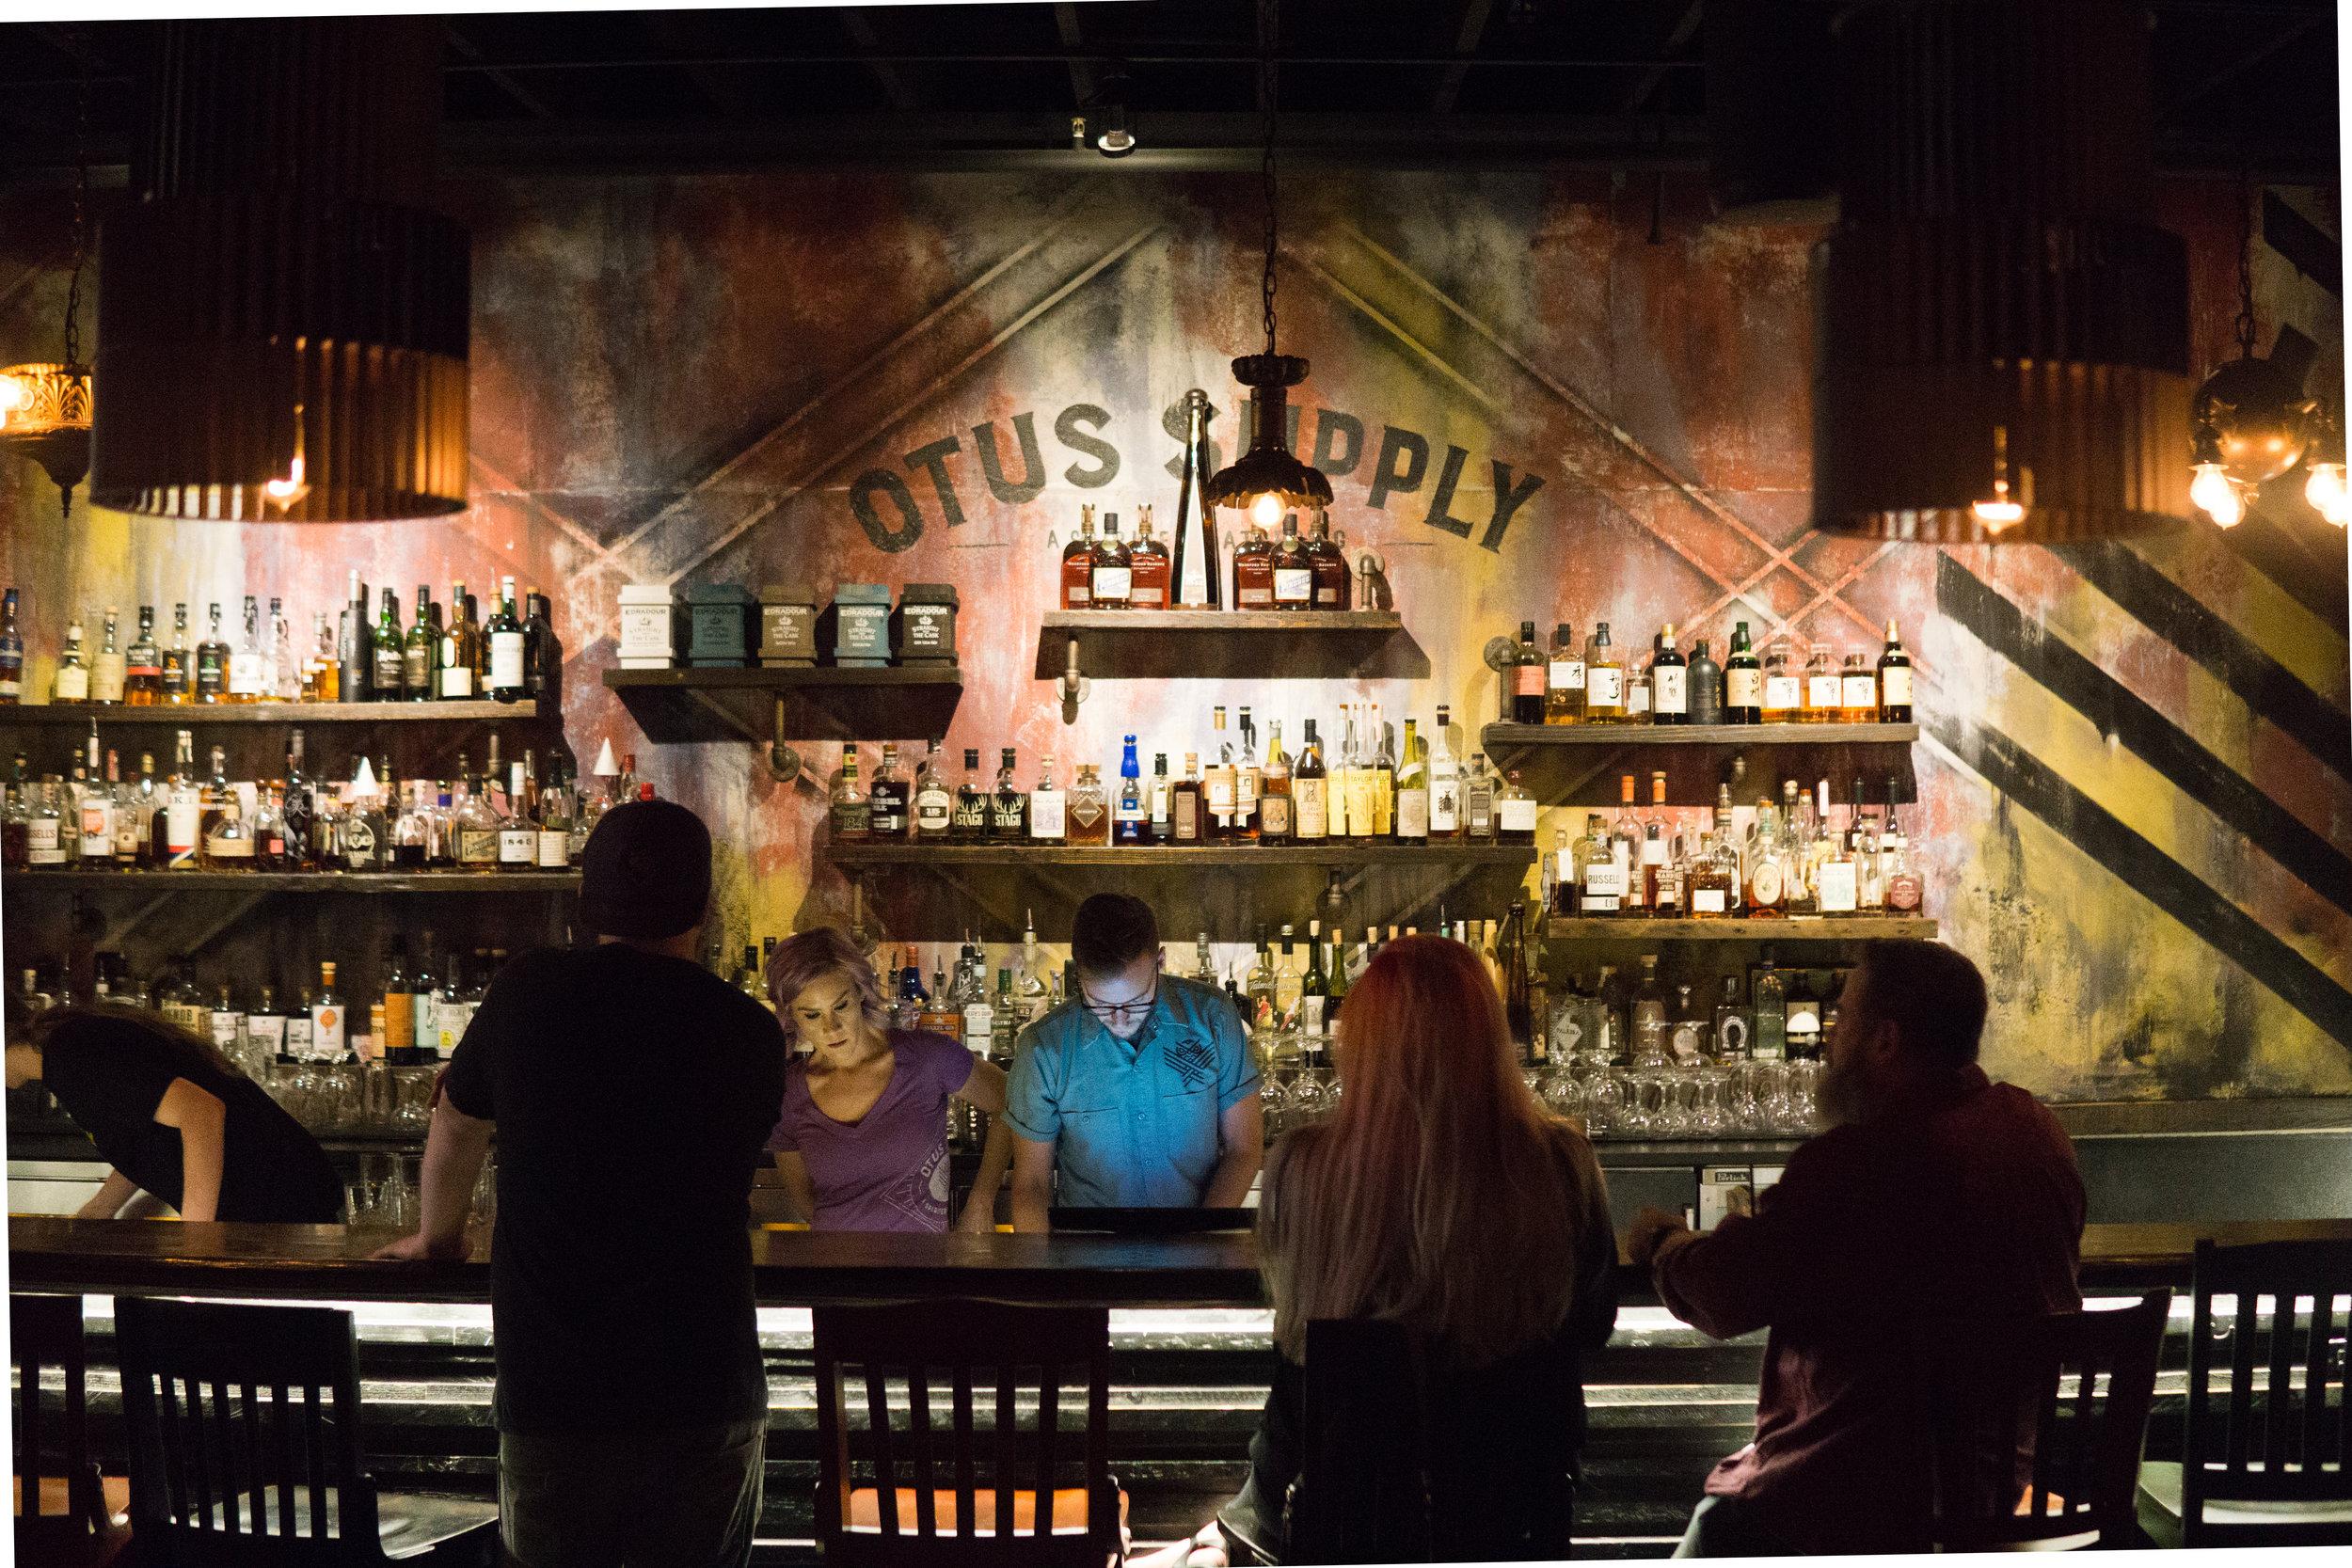 Whiskey bar at Otus Supply